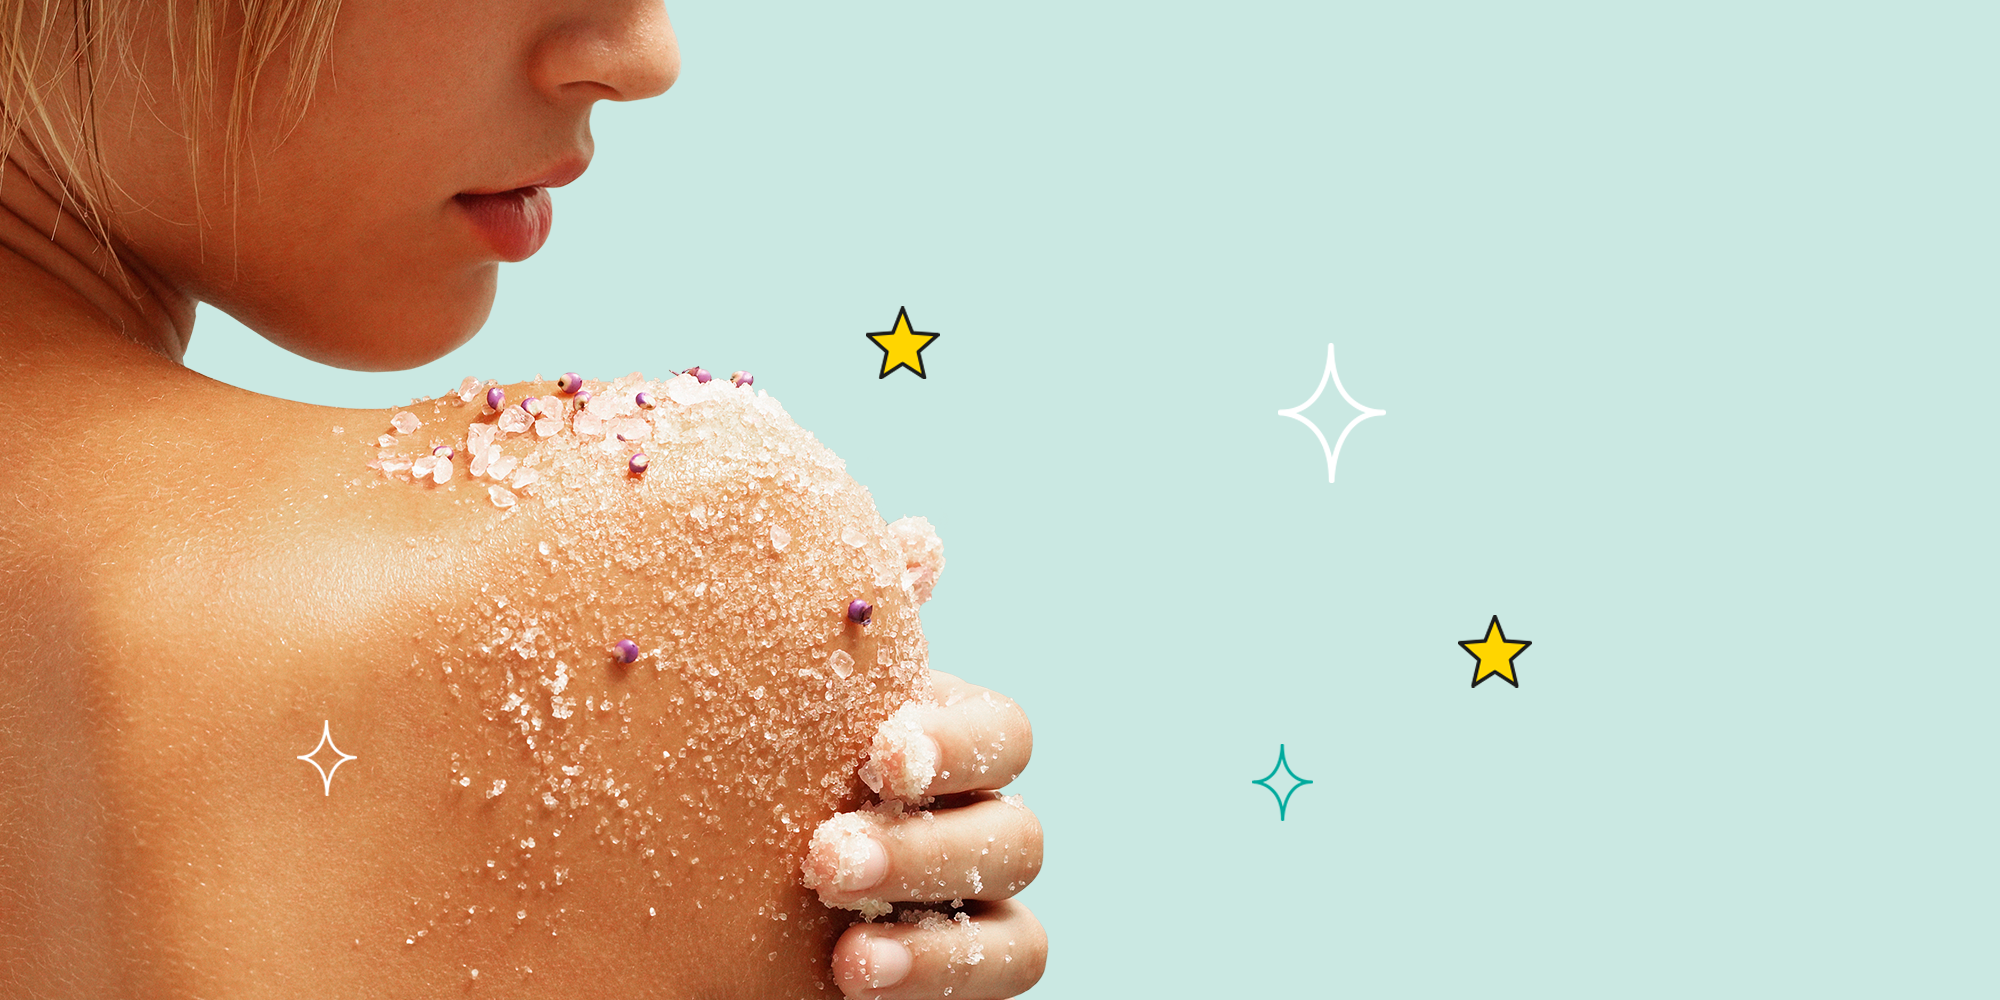 7 Diy Body Scrub Recipes For 2020 Best Homemade Scrubs For Dry Skin